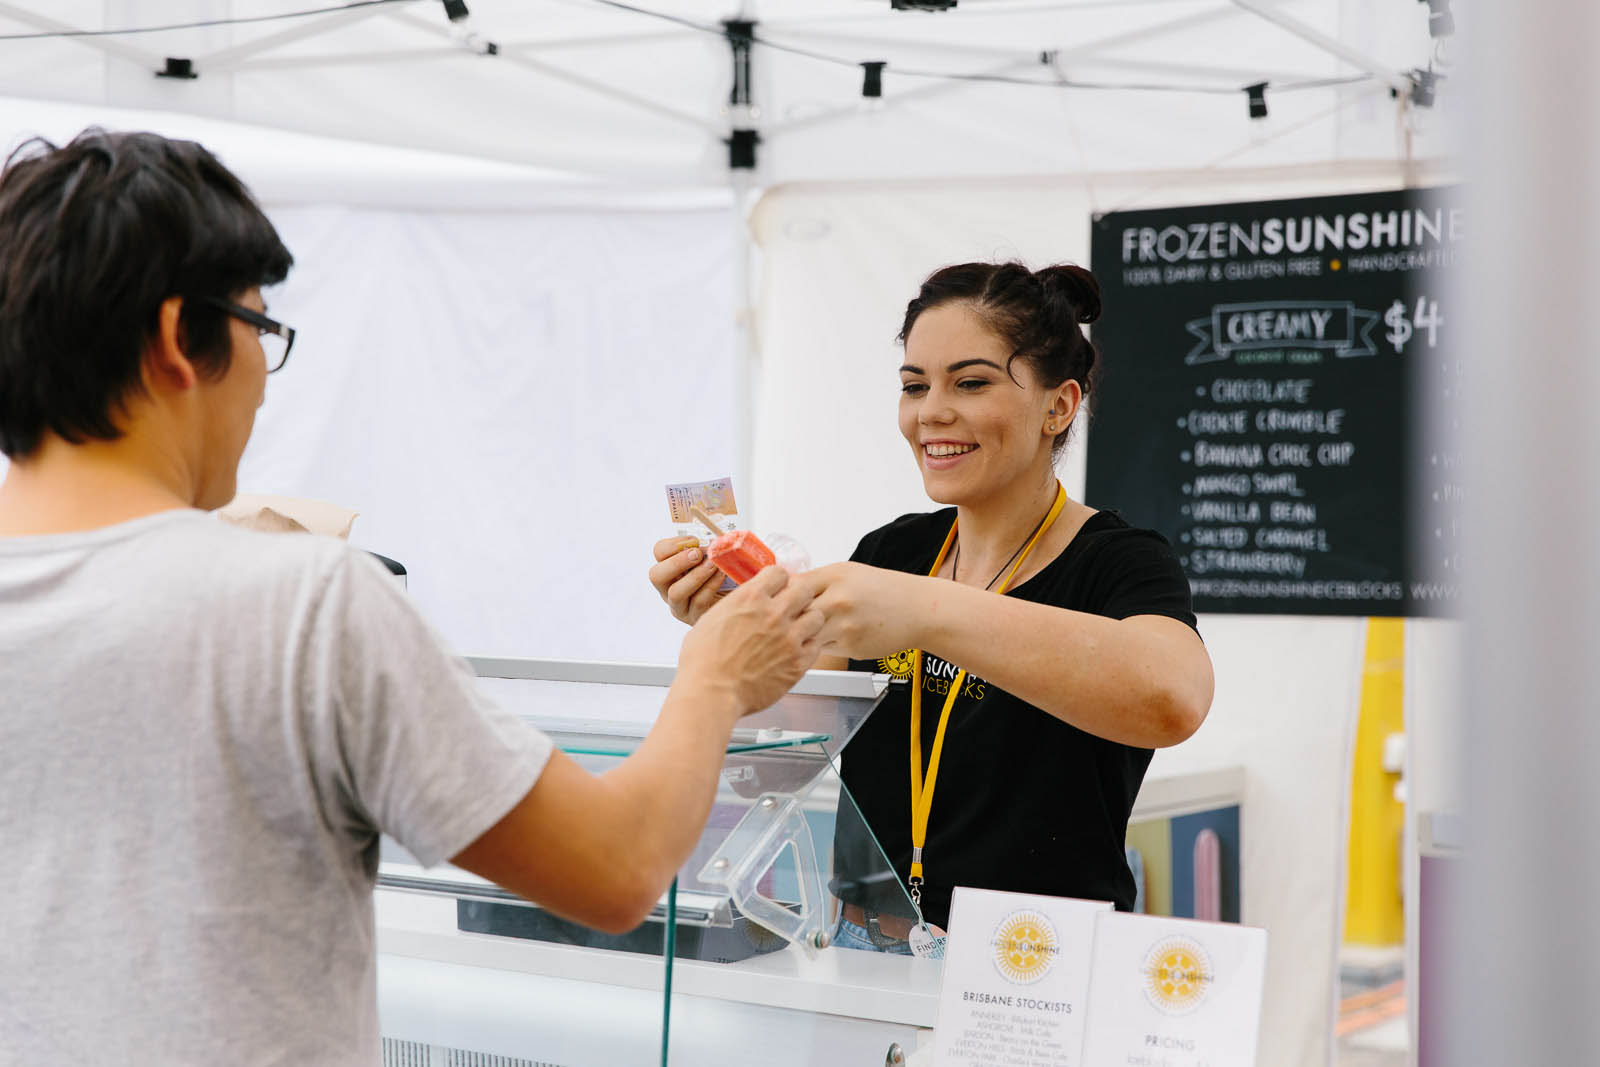 Transaction exchange between customer and stallholder at market